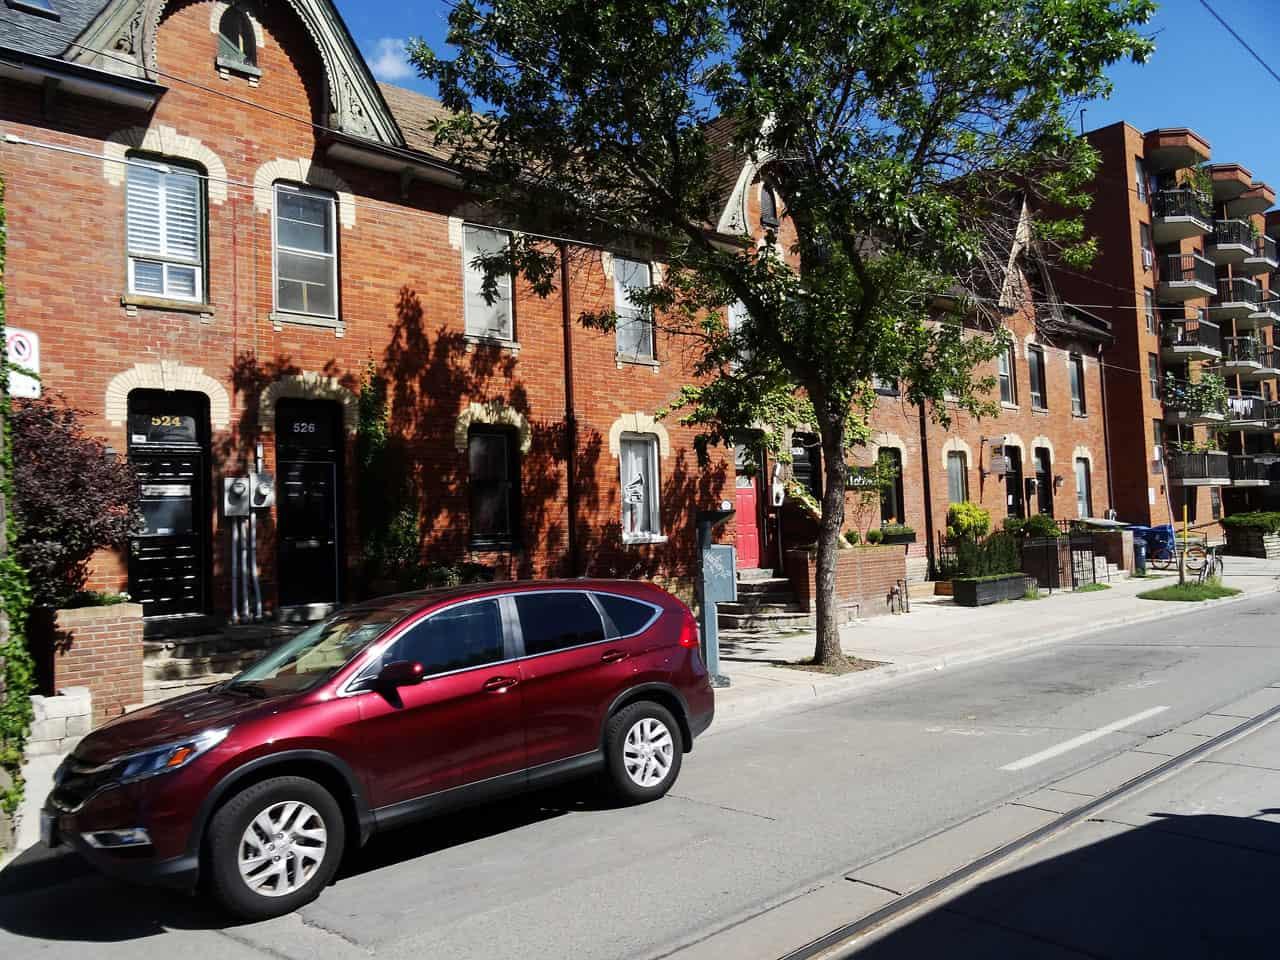 west donlands neighbourhood homes and building